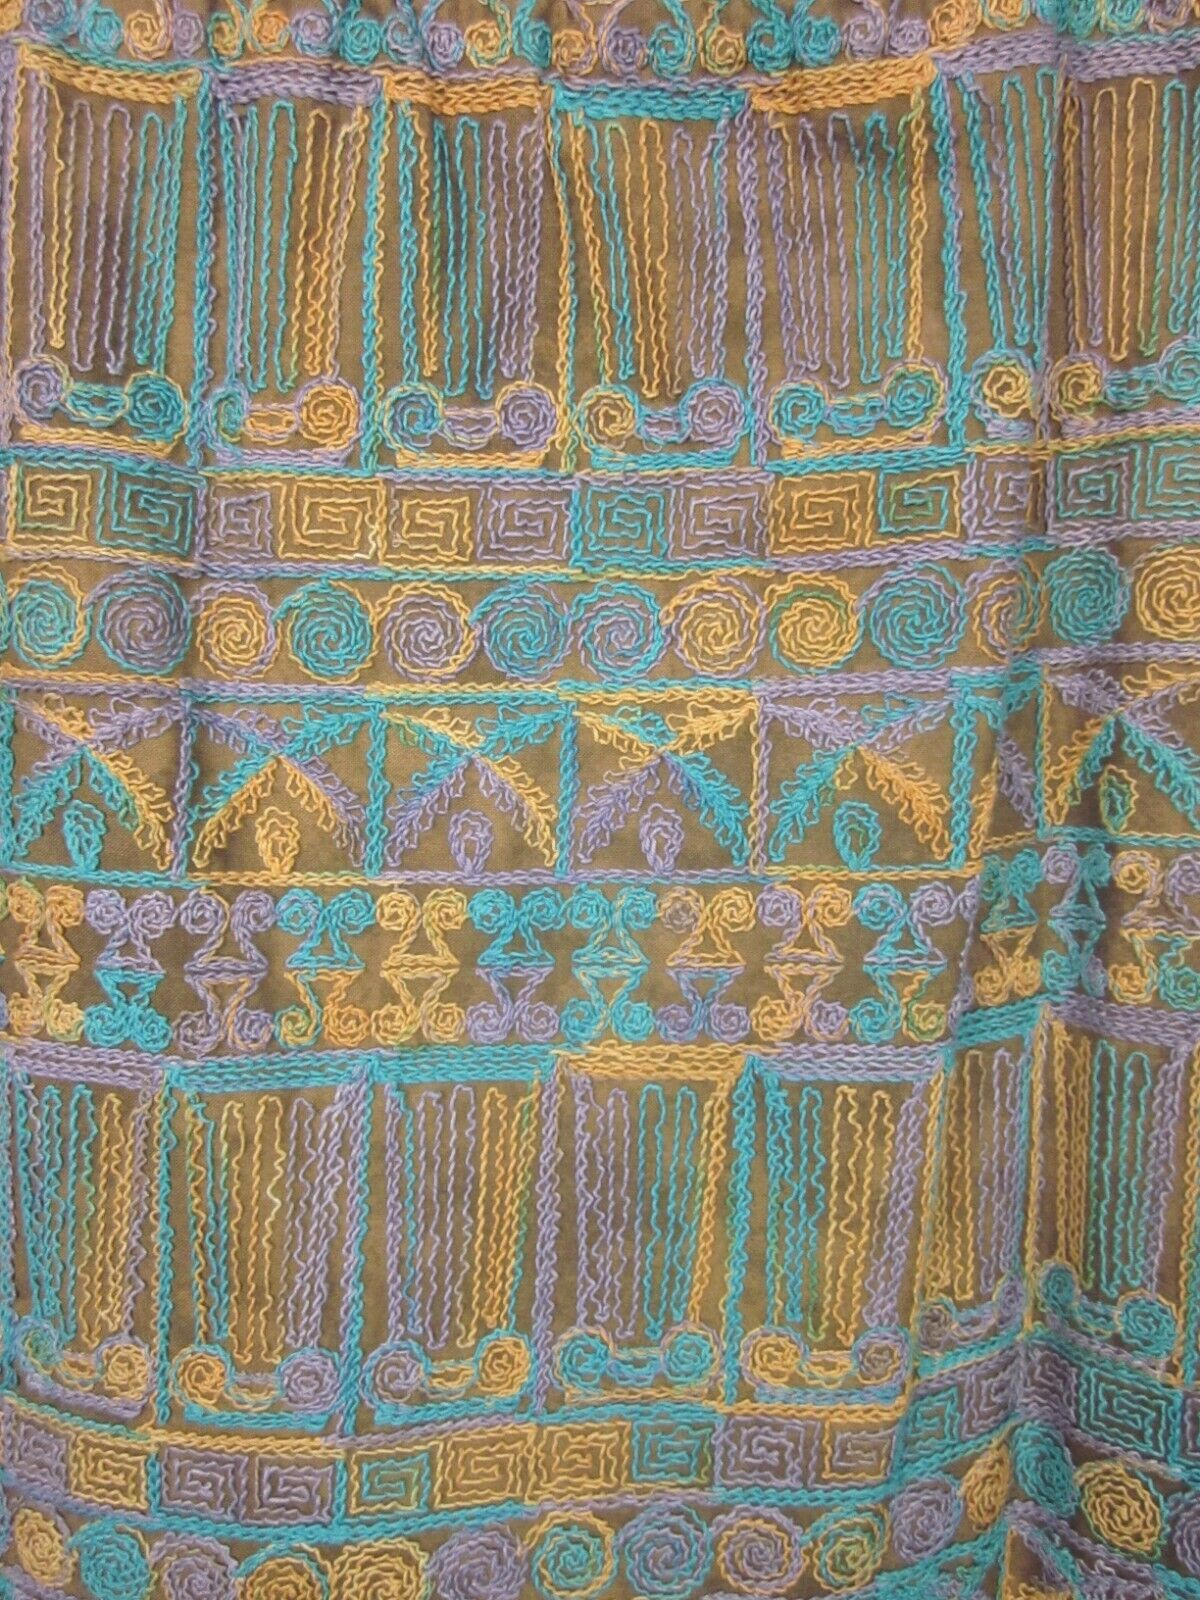 Vintage 70s Beverly Paige Embroidered Maxi Skirt Boho Hippie Yarn Fringe Hem